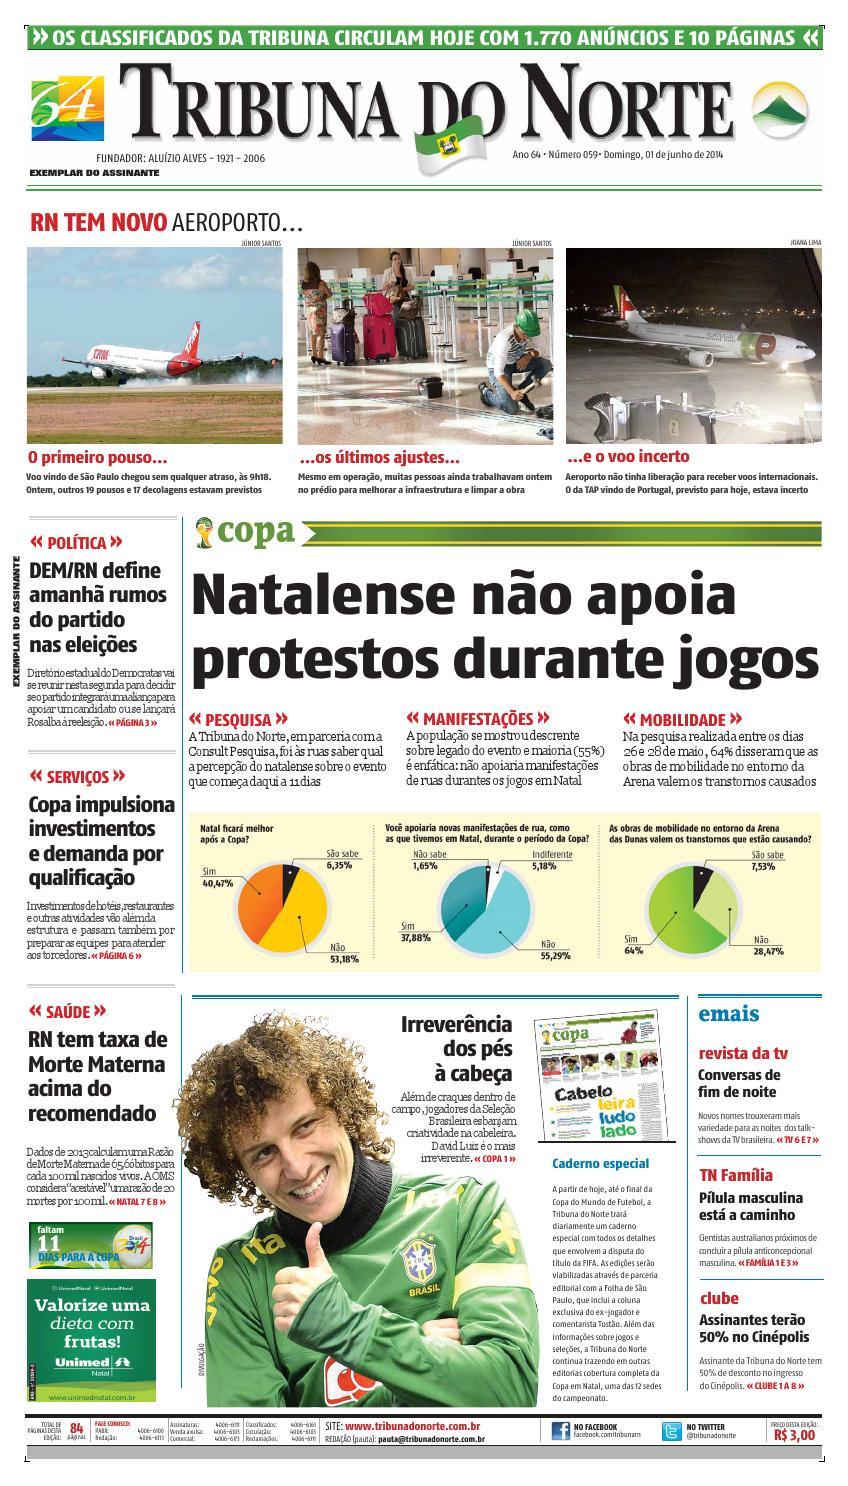 f90d9efcfd113 Tribuna do Norte - 01 06 2014 by Empresa Jornalística Tribuna do Norte Ltda  - issuu